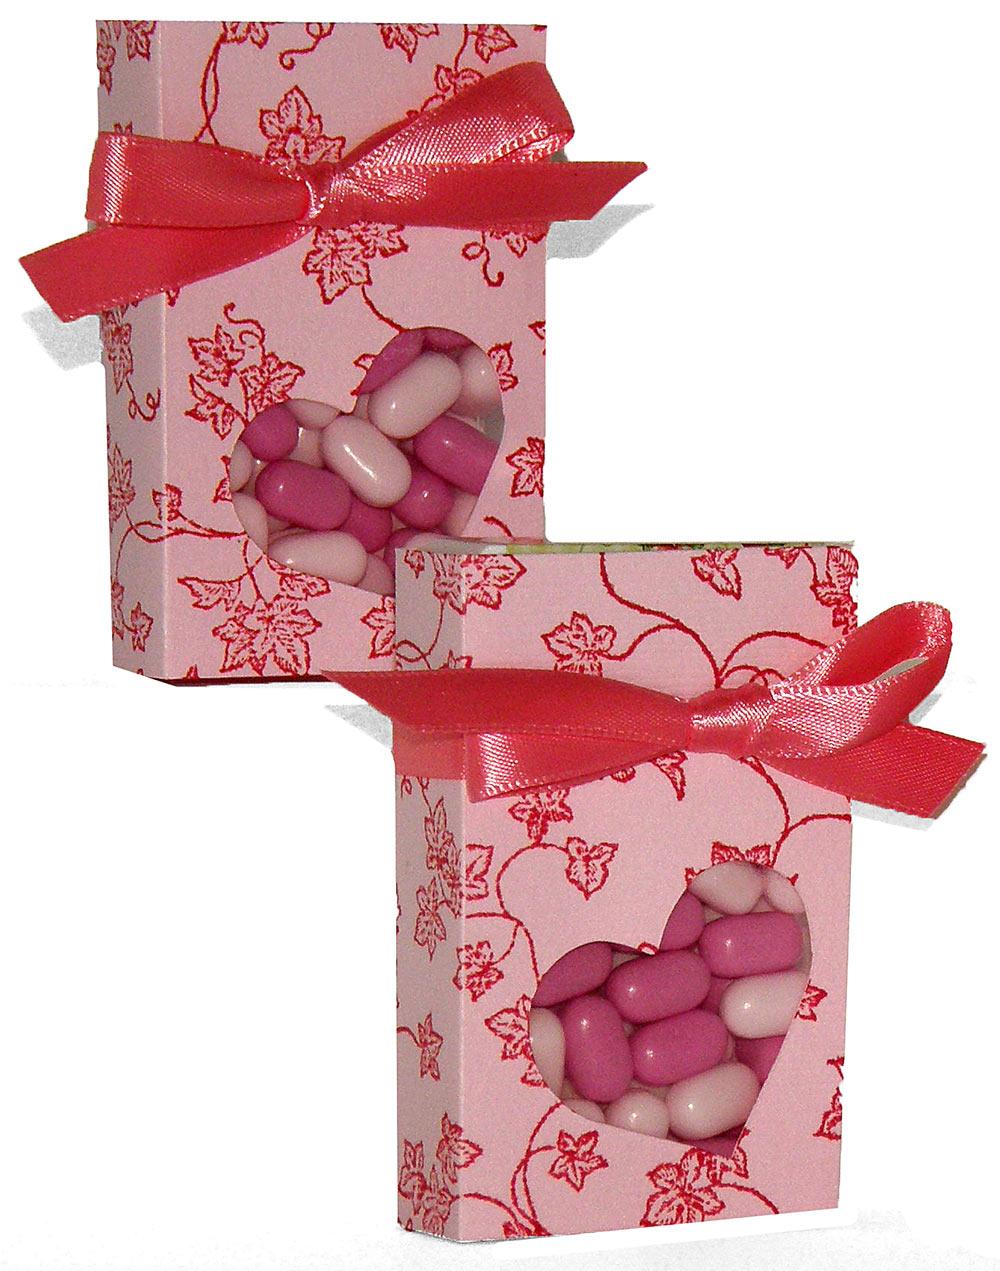 Classroom ValentinesTic Tac Treat BoxesPazzles Craft Room